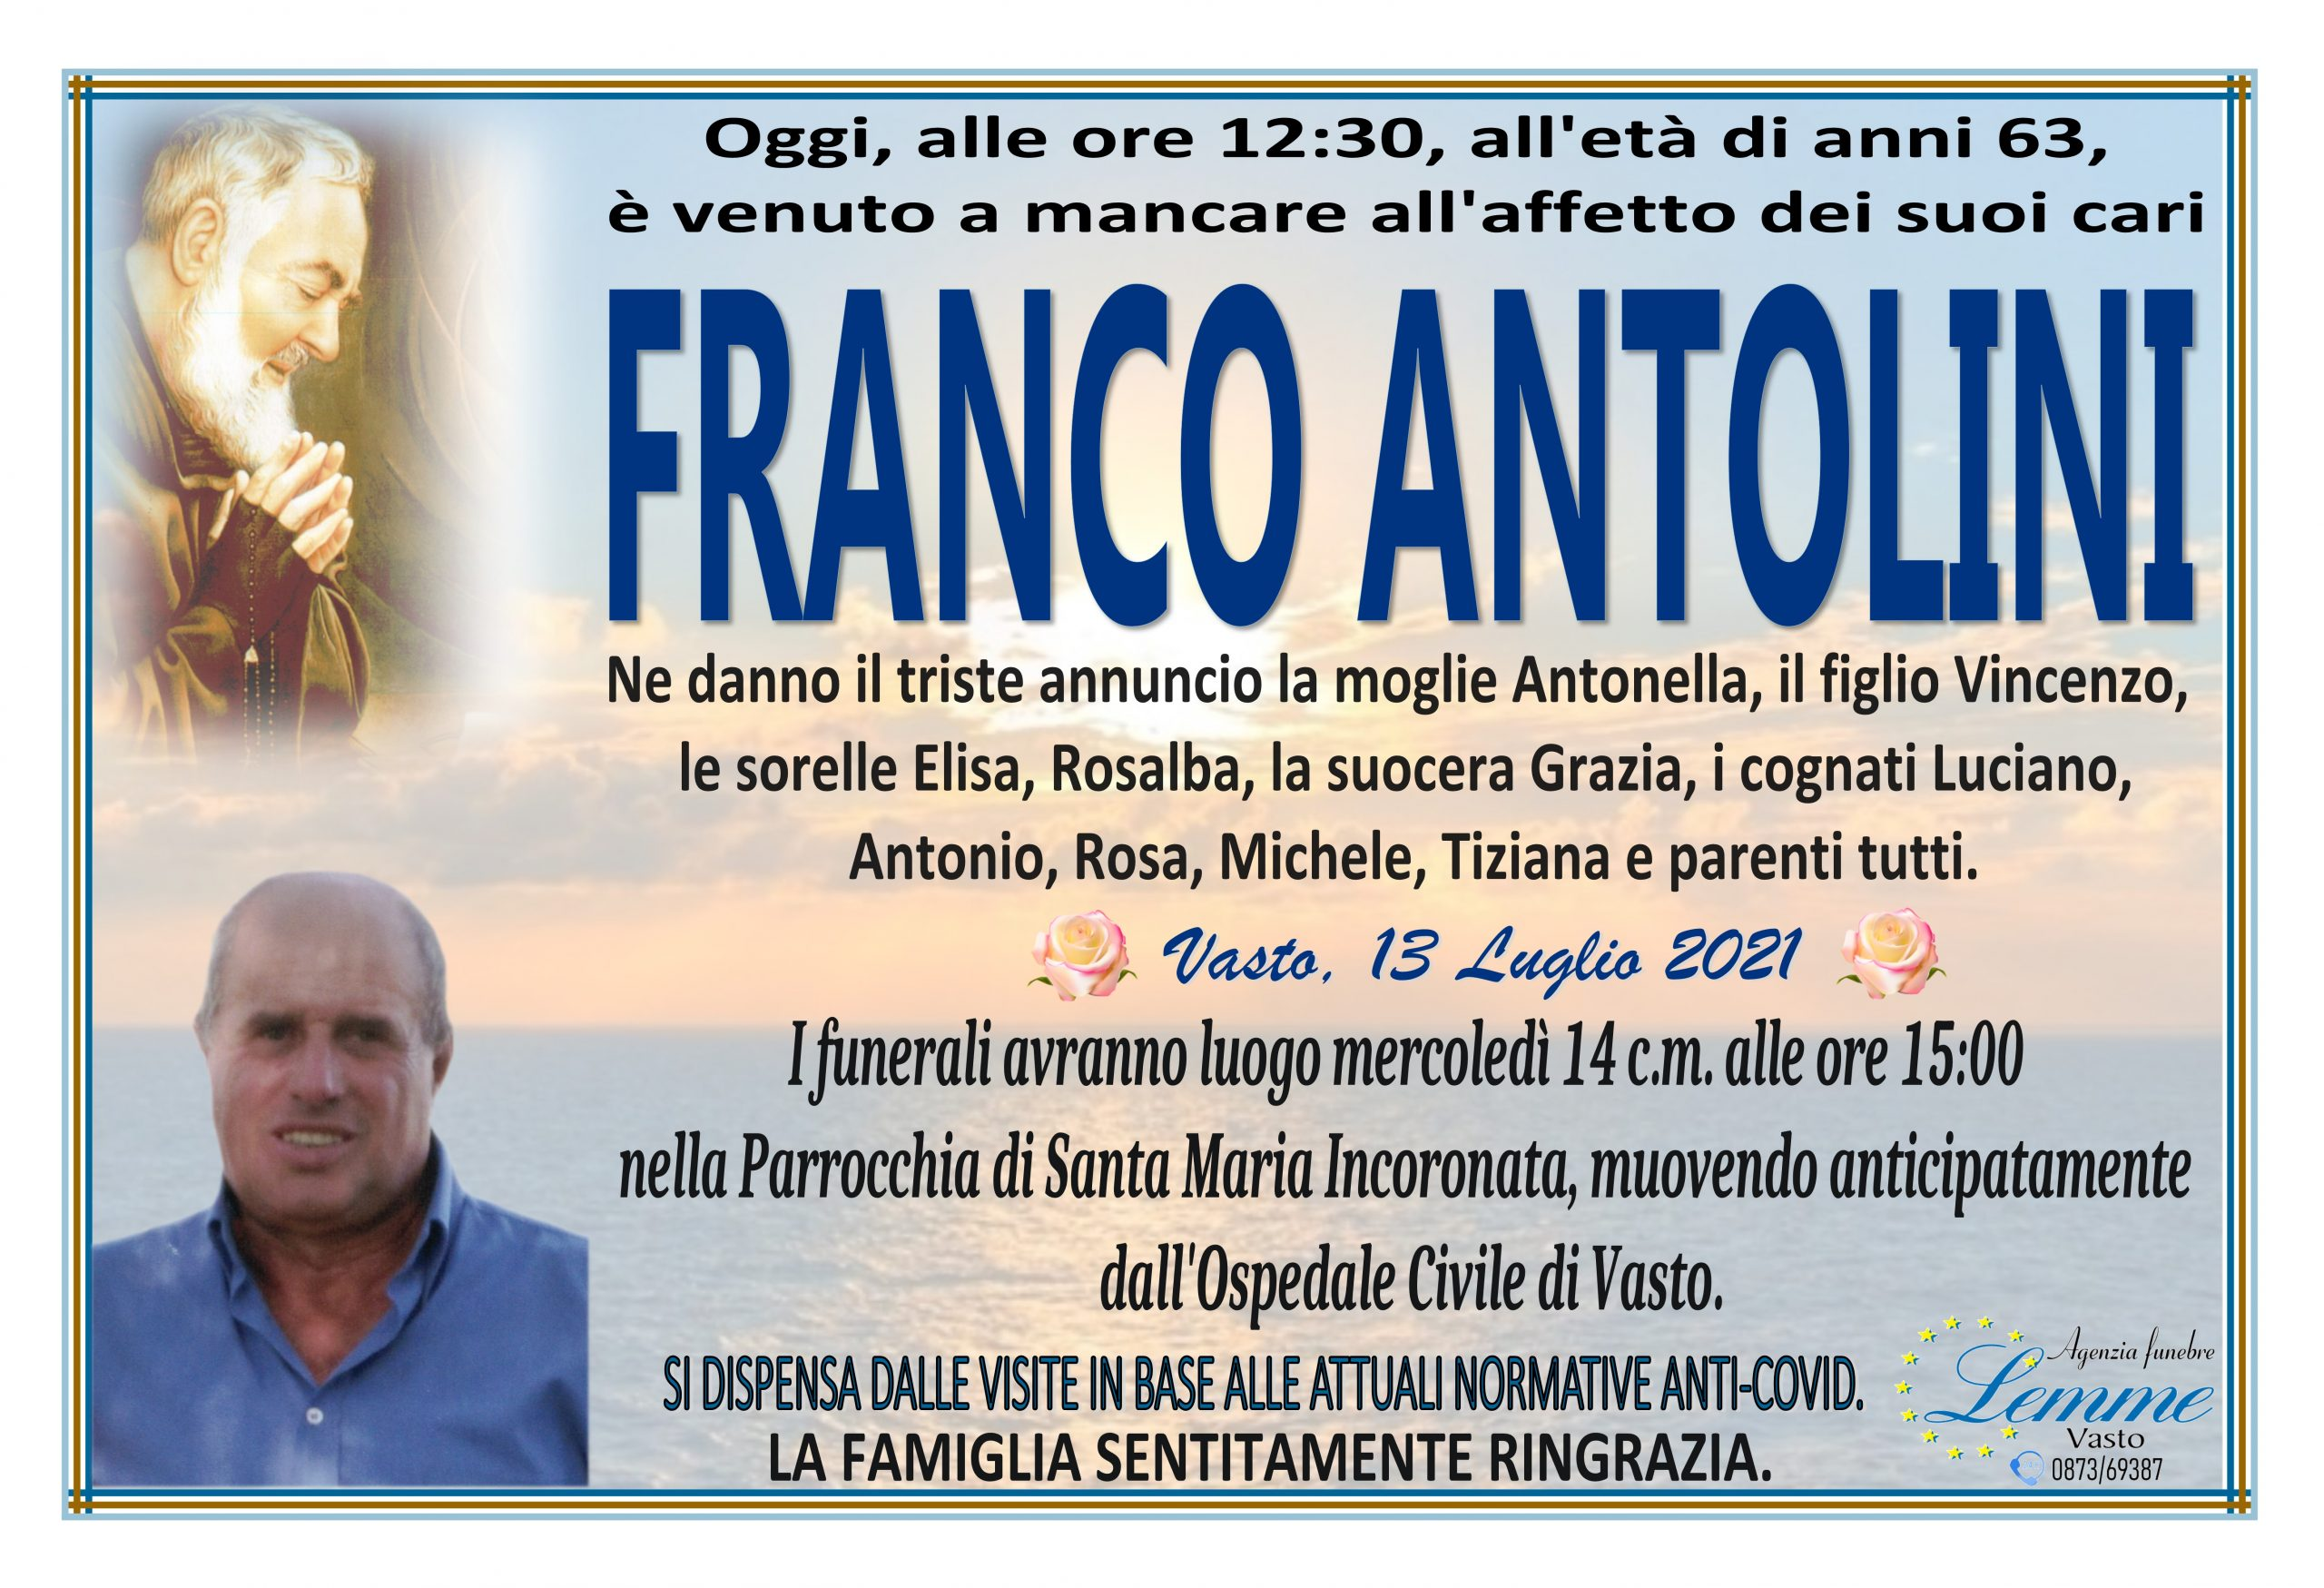 FRANCO ANTOLINI